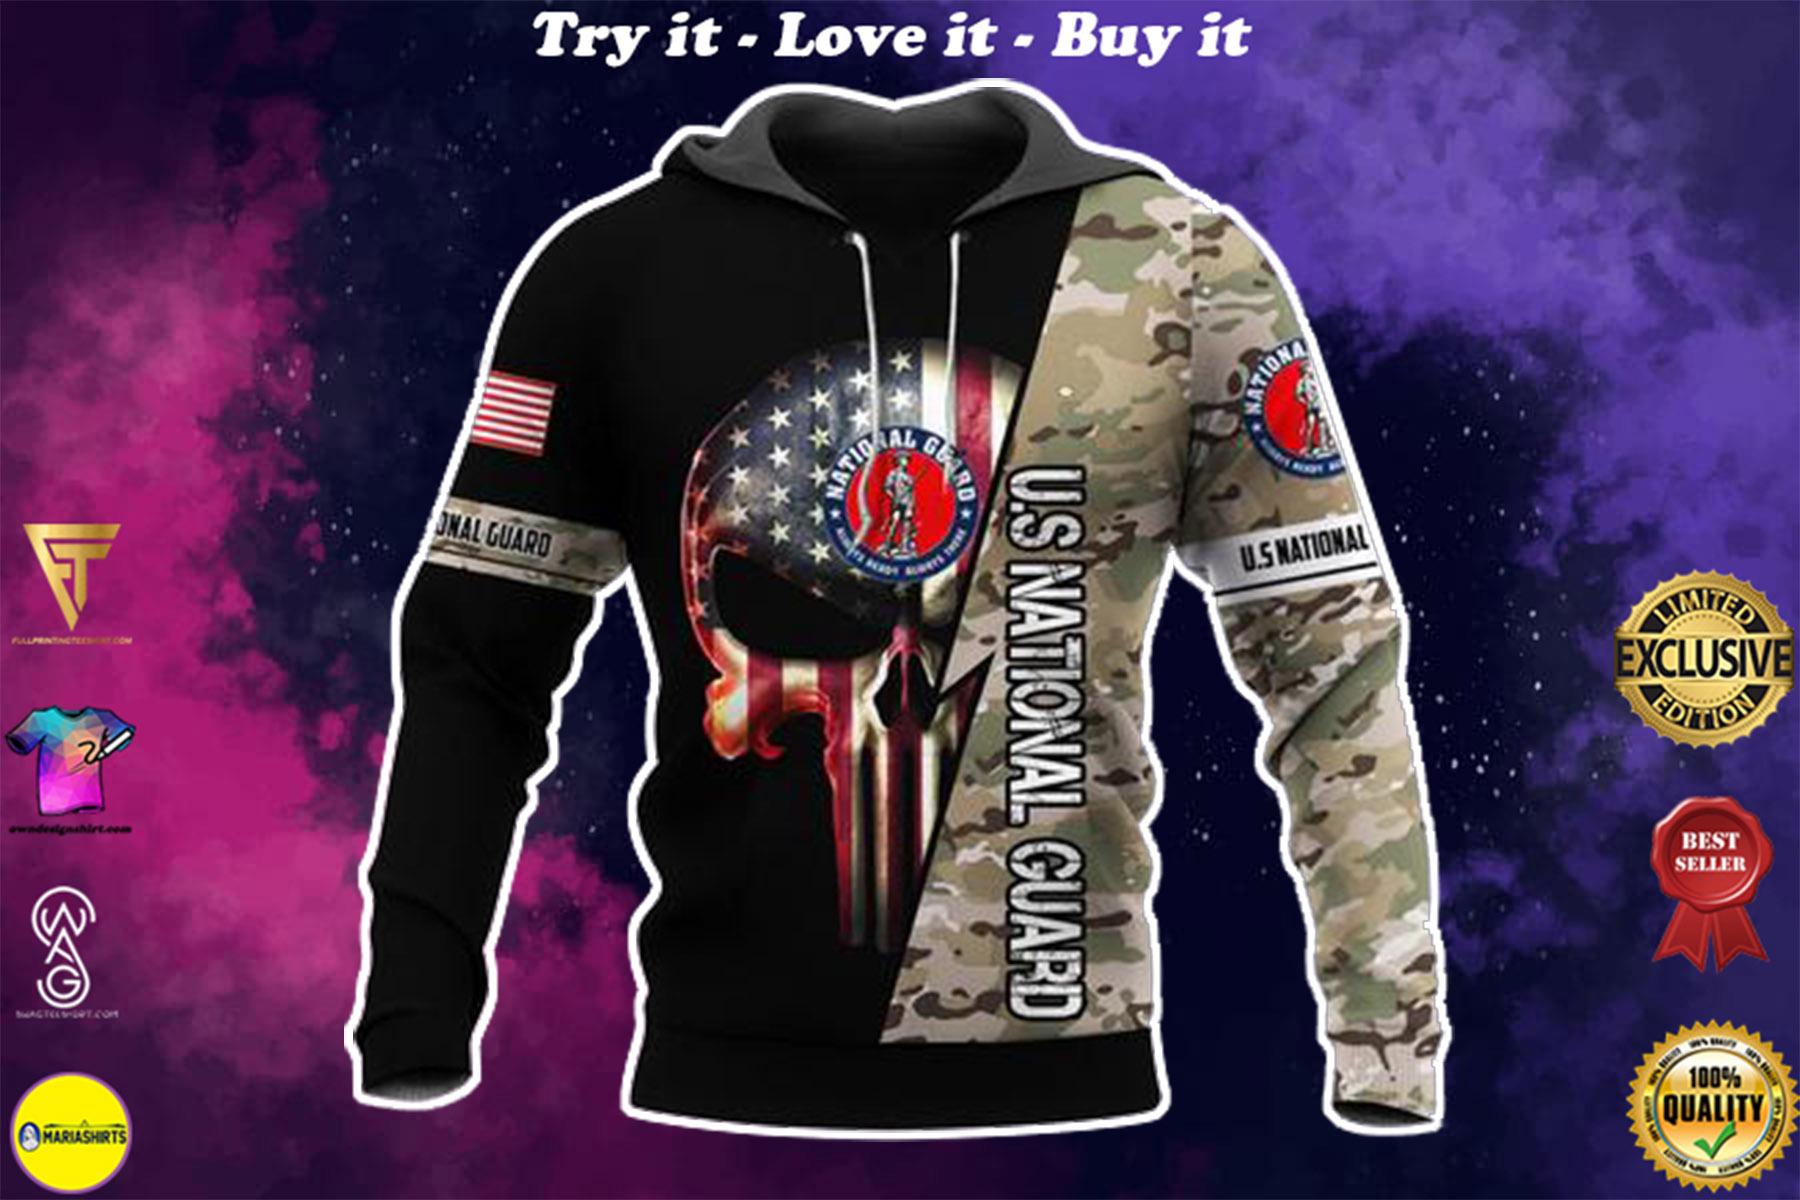 [highest selling] us national guard skull american flag camo full over printed shirt - maria